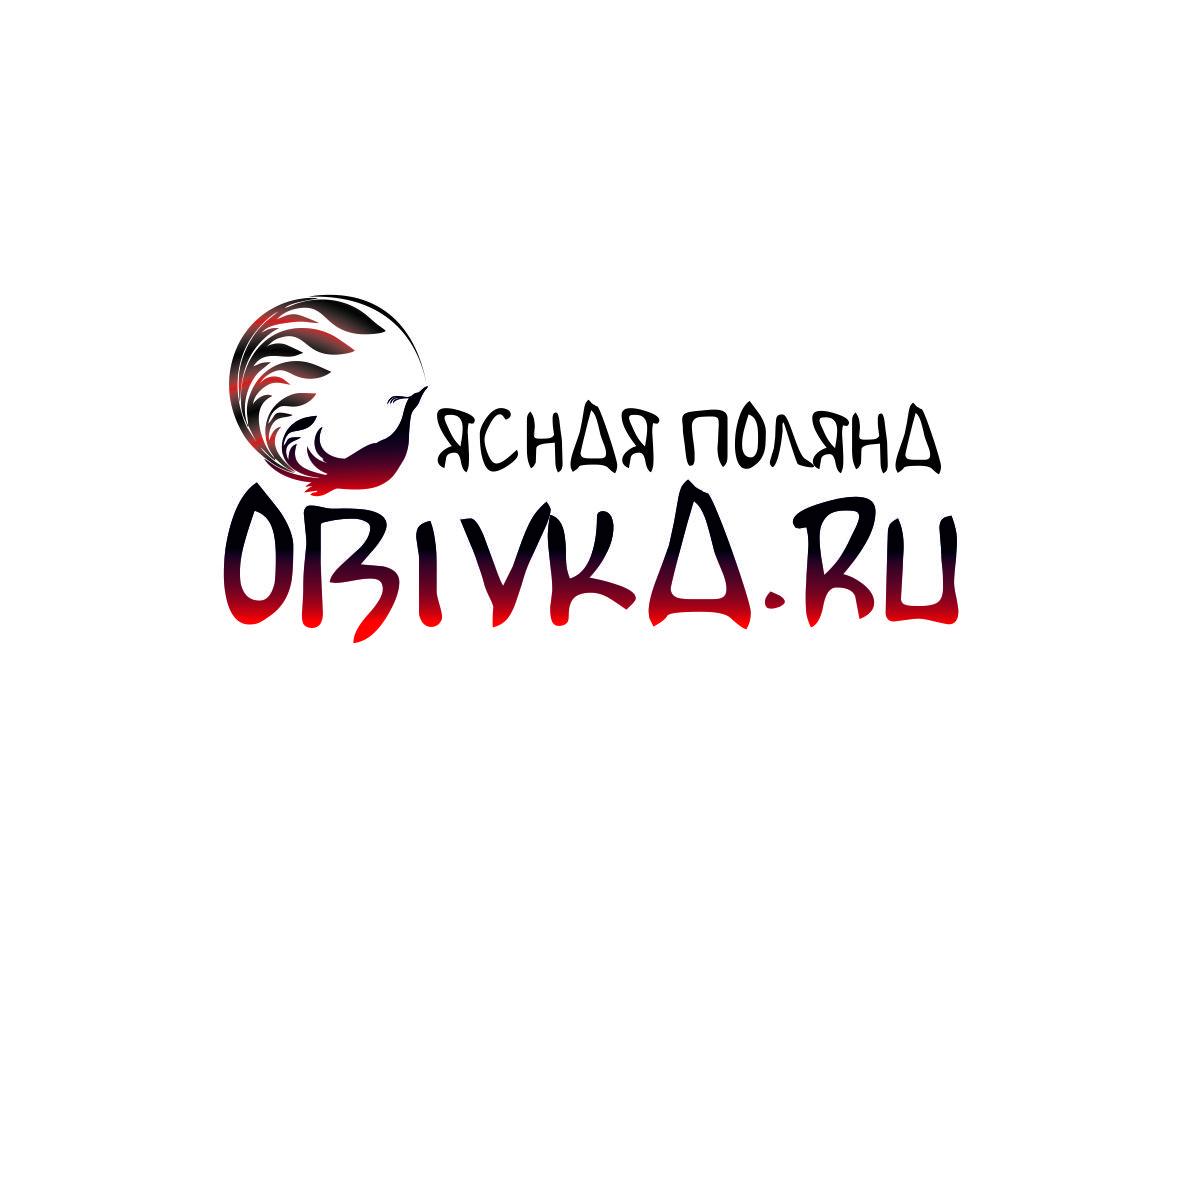 Логотип для сайта OBIVKA.RU фото f_4565c10b653b7764.jpg